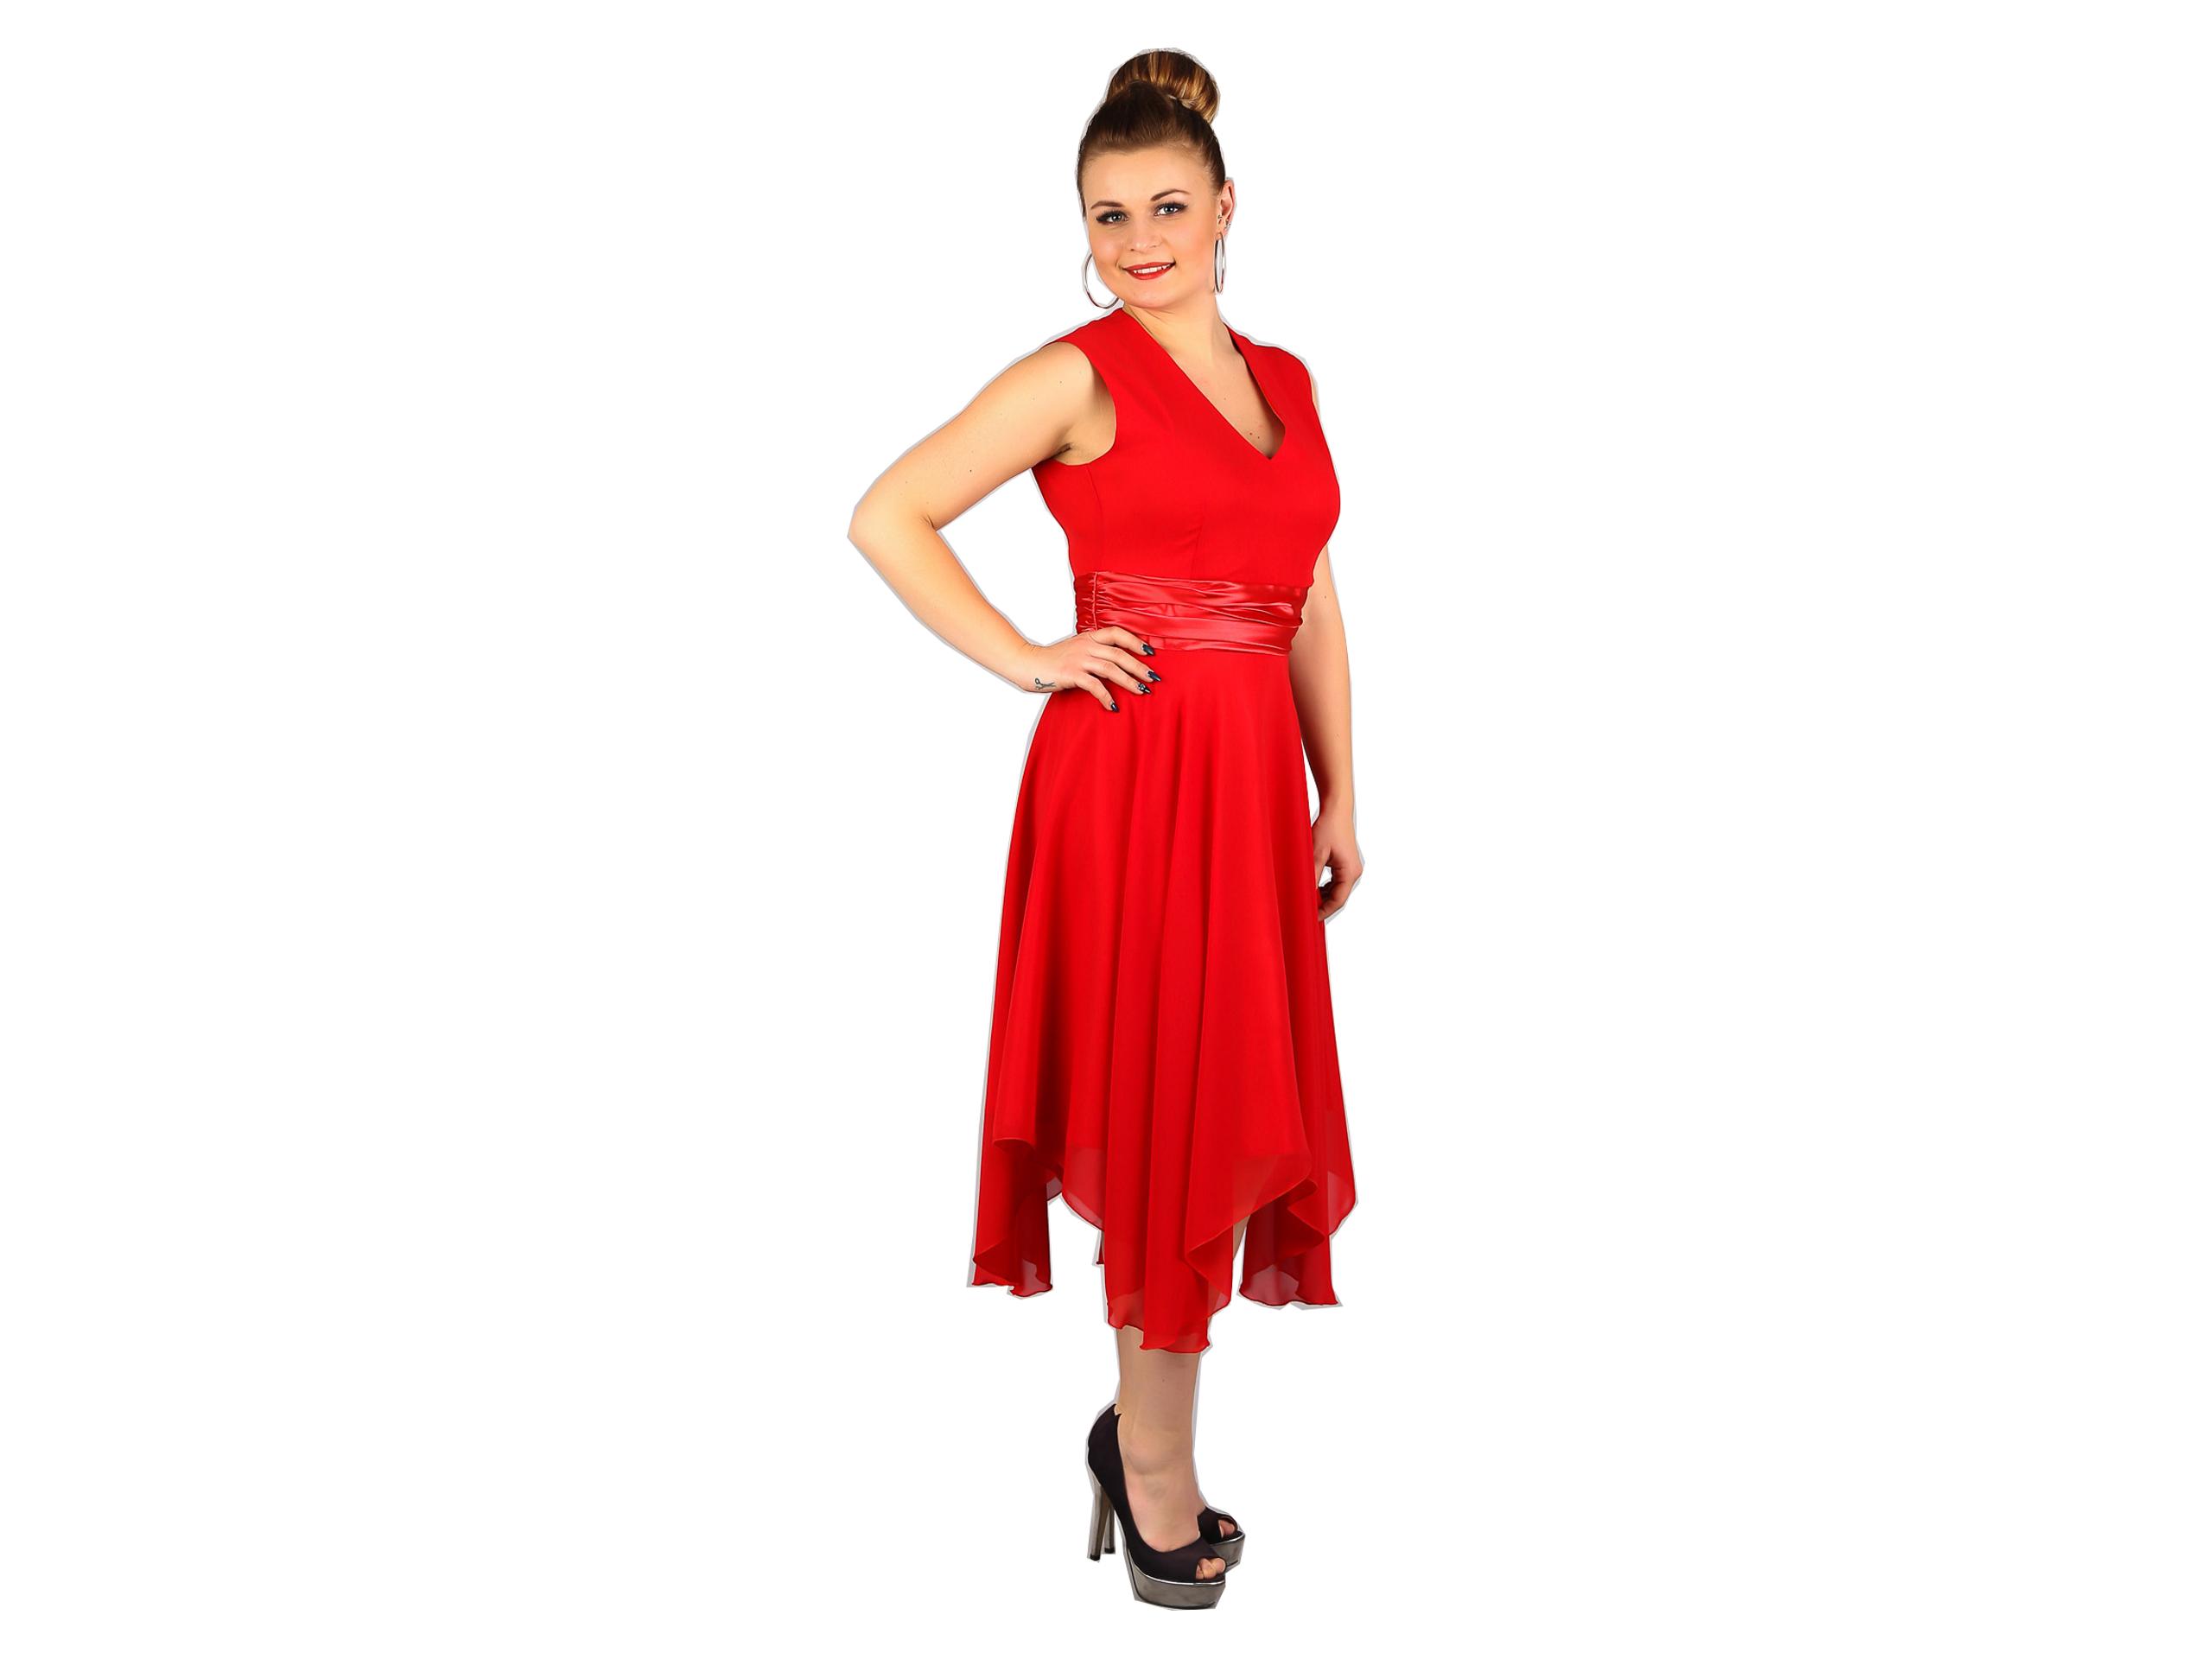 b6c9d7ee09 Sukienka rozkloszowana sukienki wesele ślub 52 - 7116418988 ...